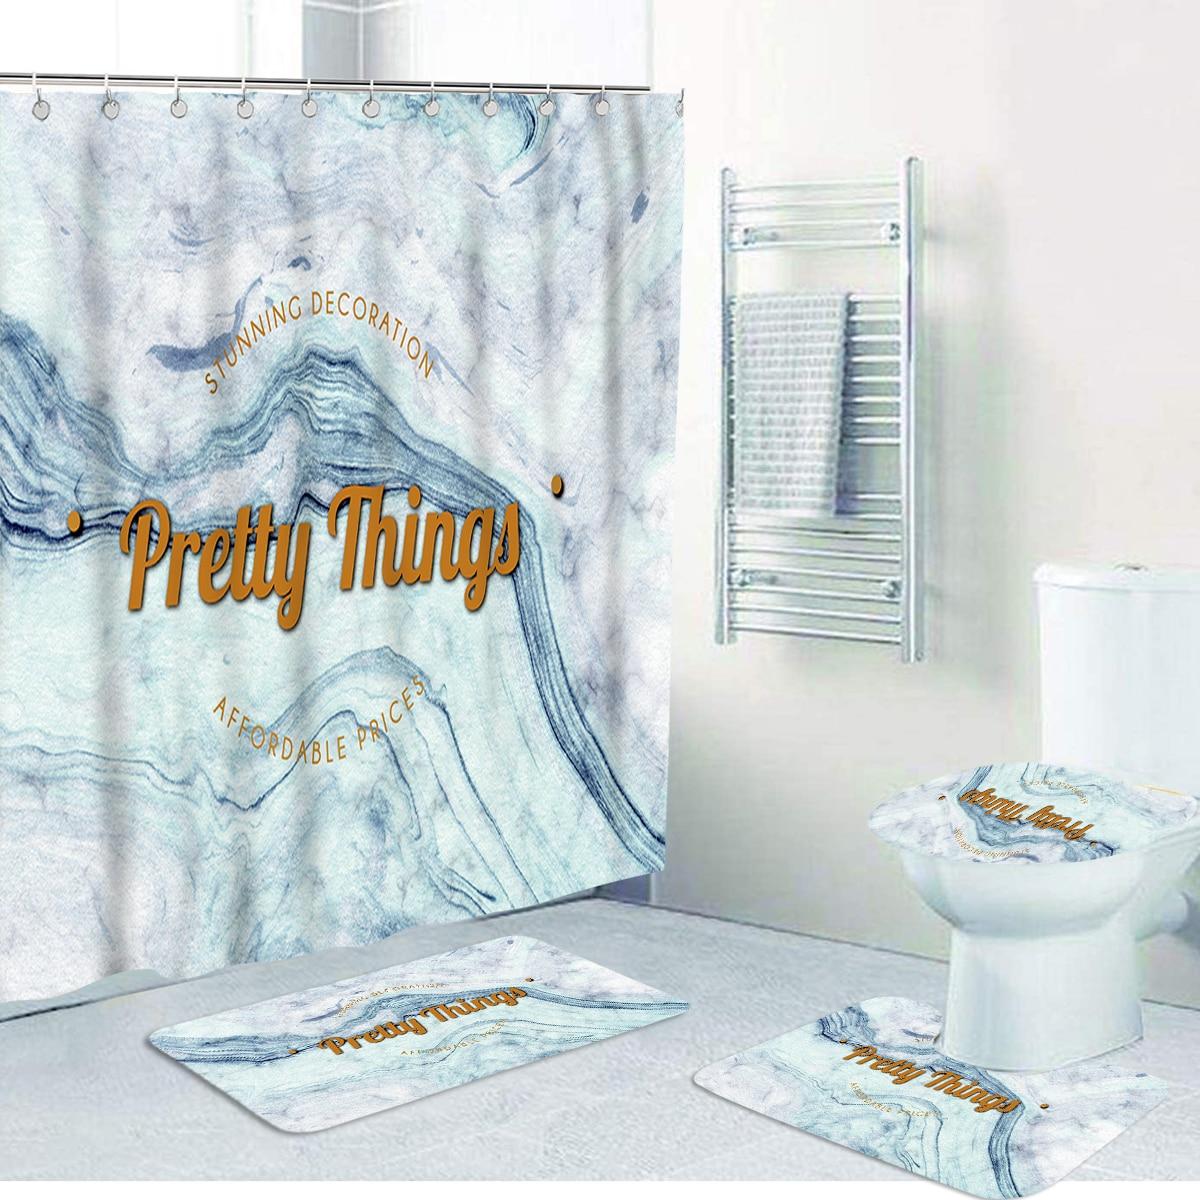 1 Stück Closestool-Matte oder Duschvorhang mit Buchstaben Grafik